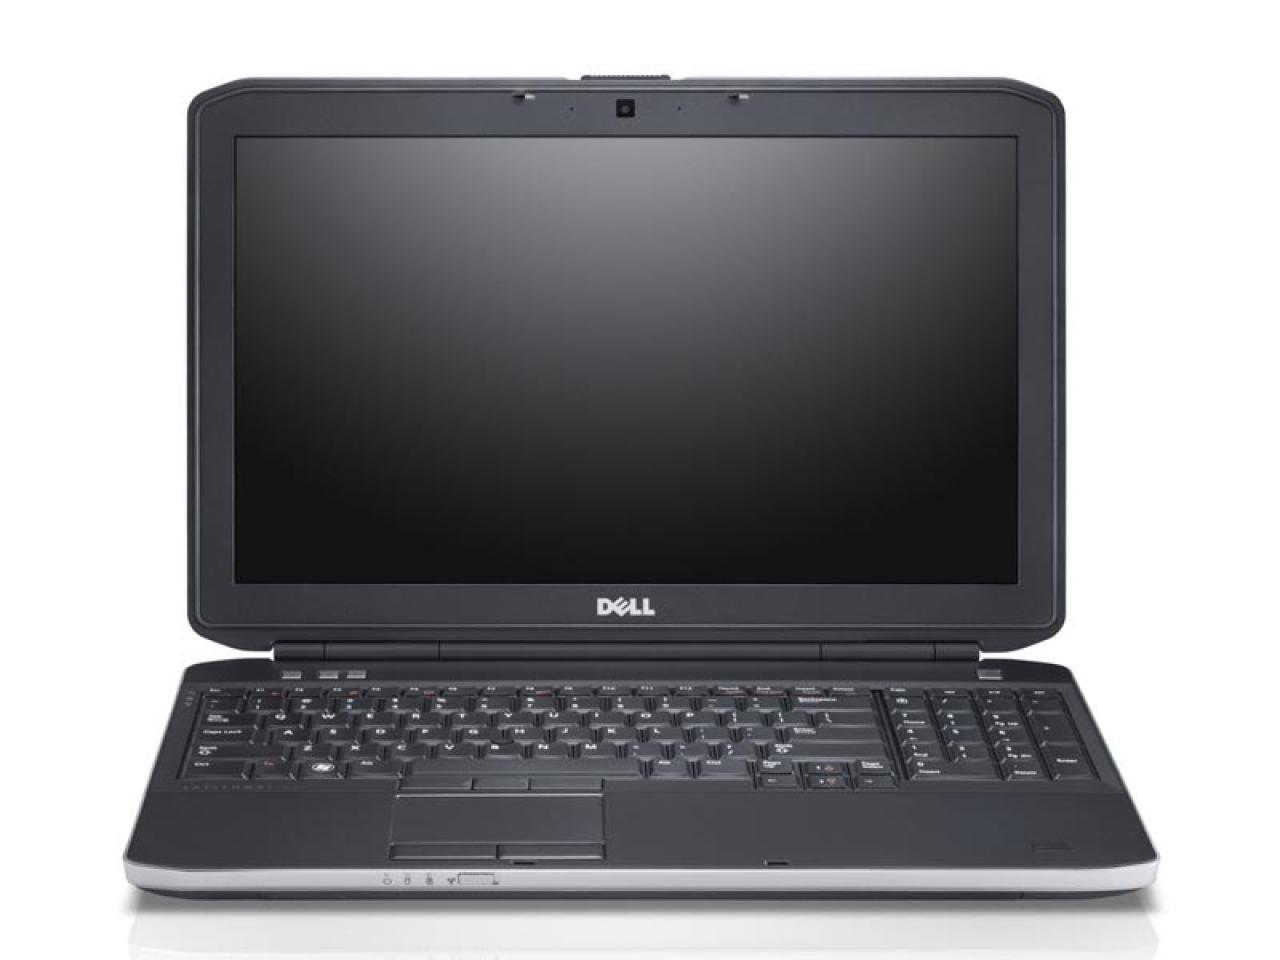 Dell Latitude E5530  - shop.bb-net.de